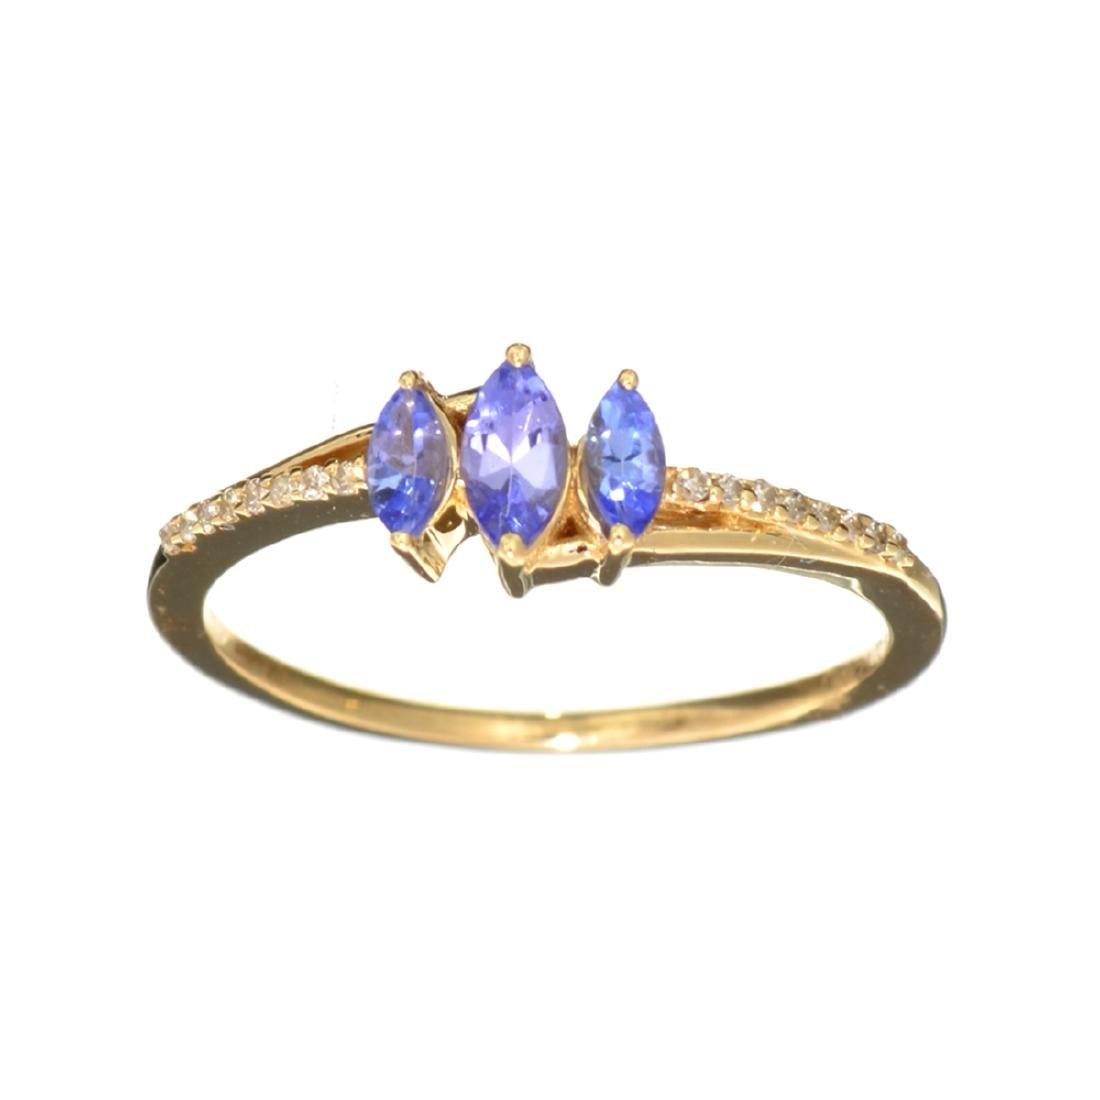 Designer Sebastian 14 KT Gold, Marquise Cut Tanzanite